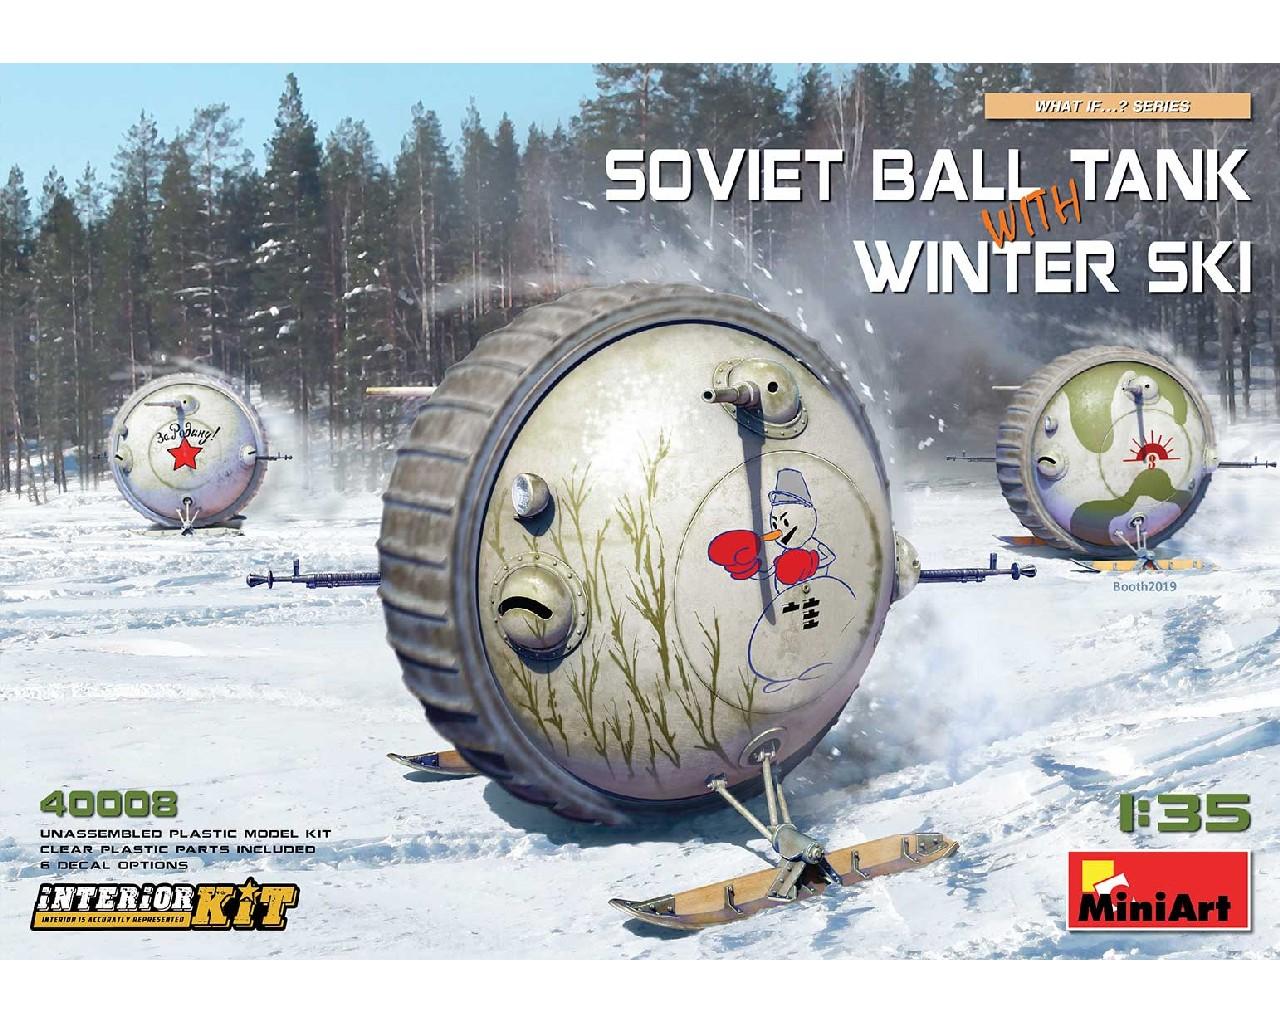 1/35 Soviet Ball Tank with Winter Ski. Interior Kit